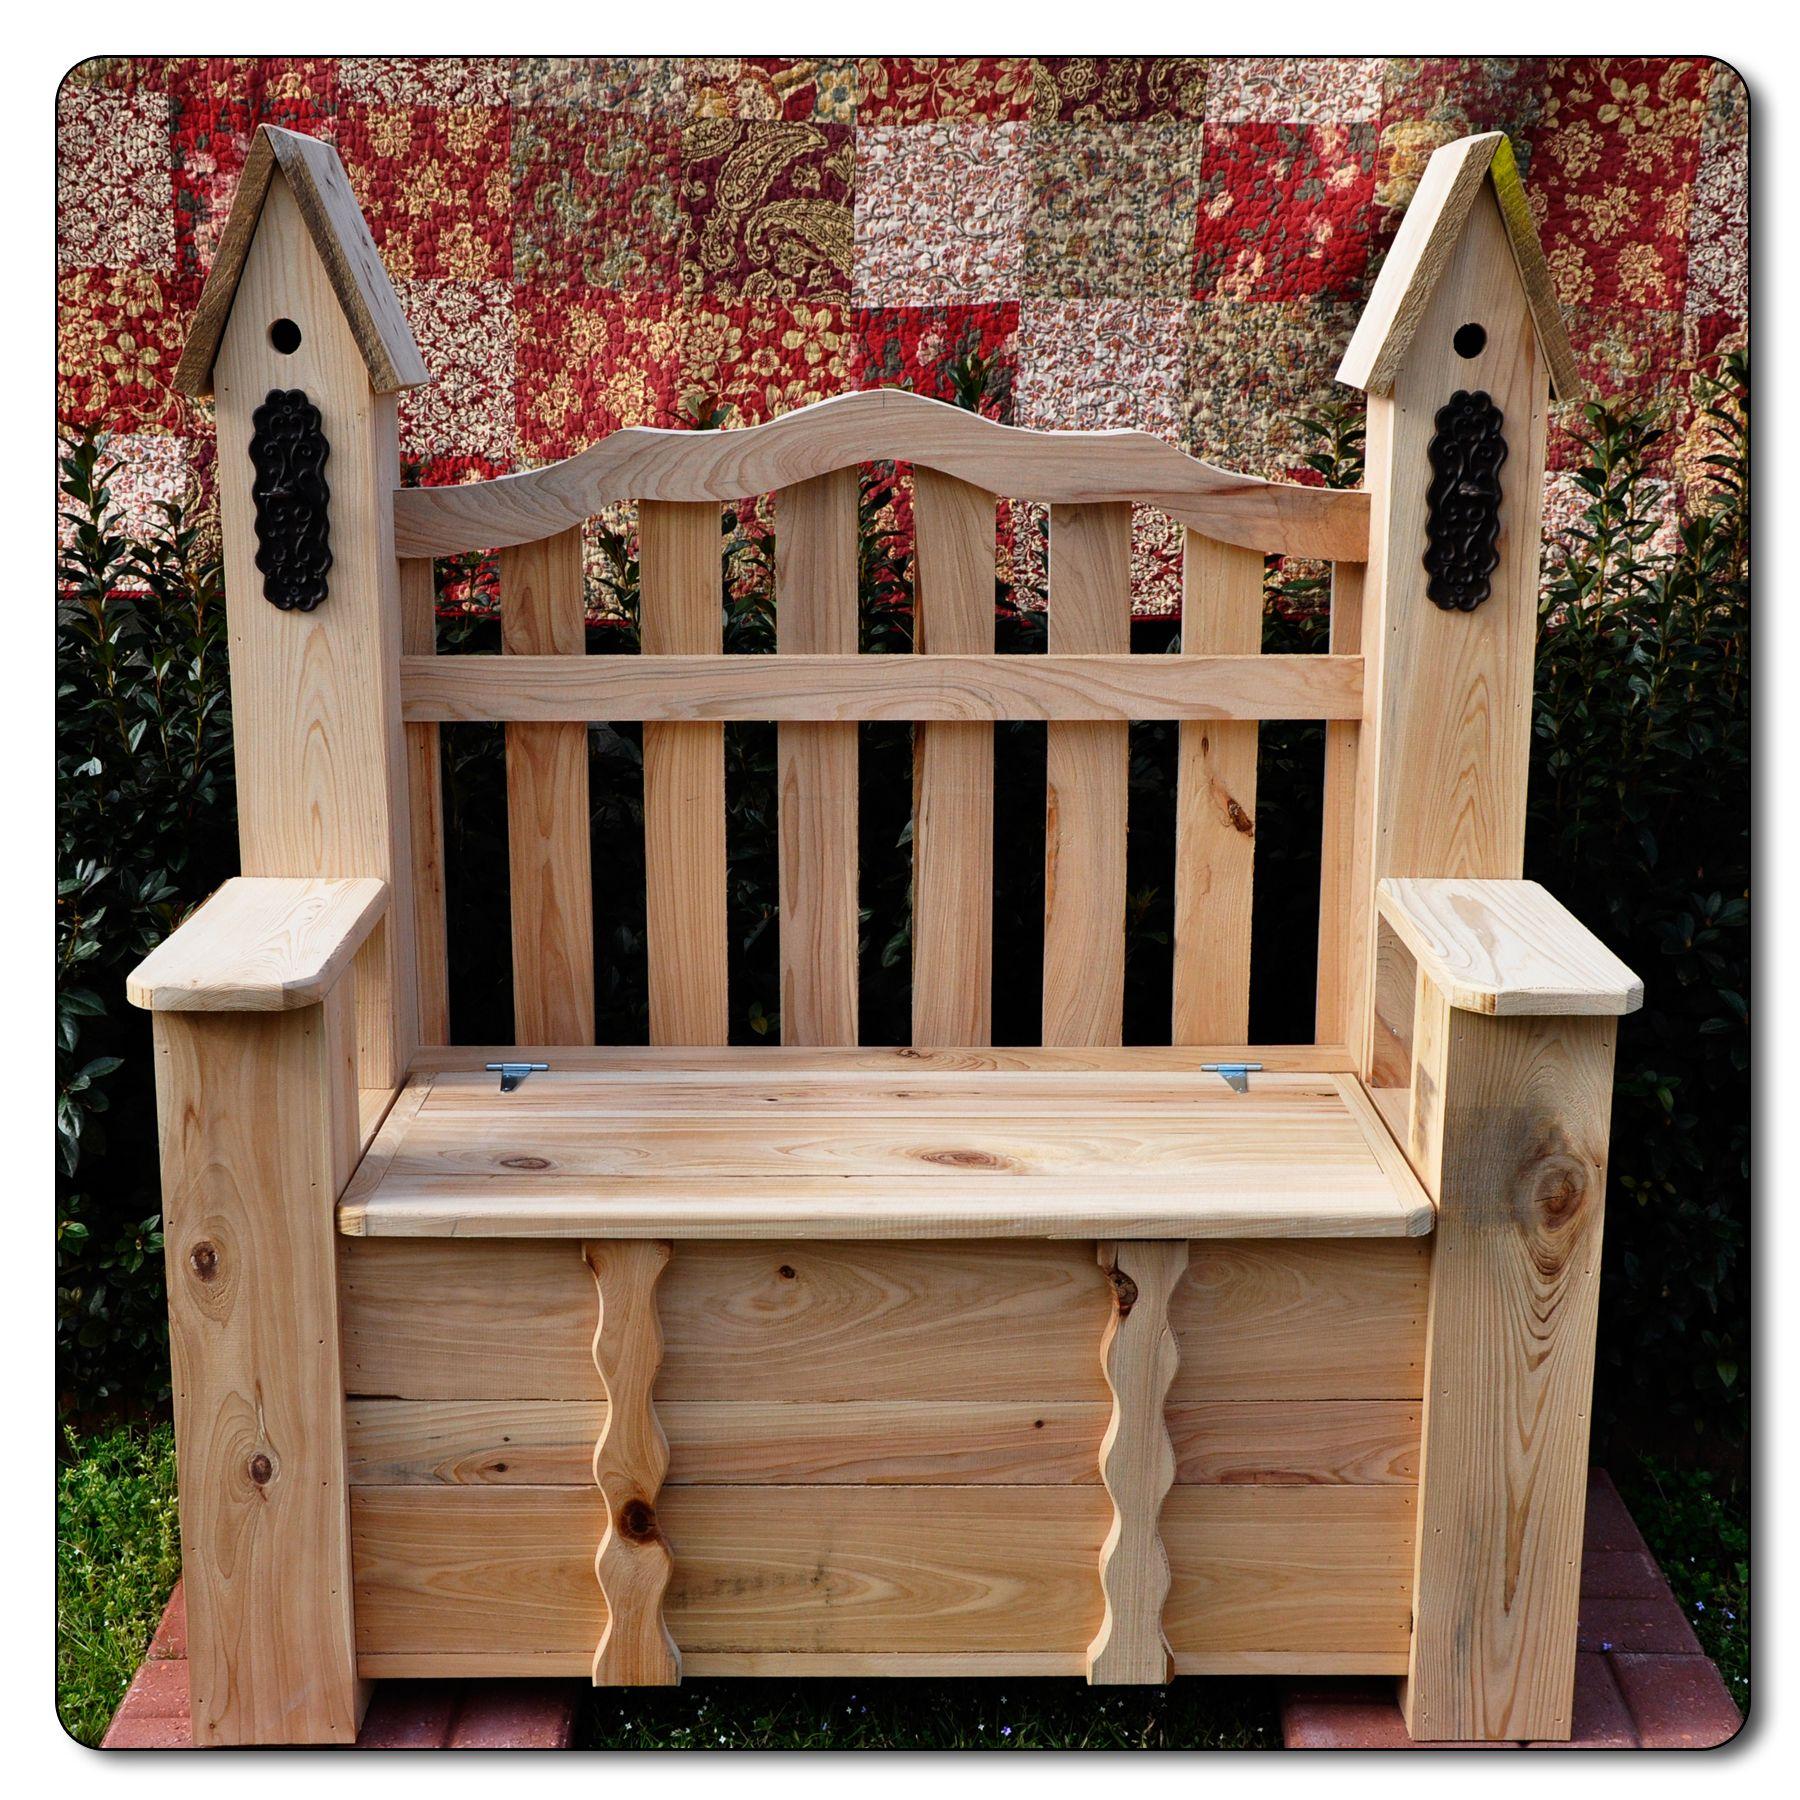 Wooden Birdhouse Bench 1 Garden For The Yard Wooden